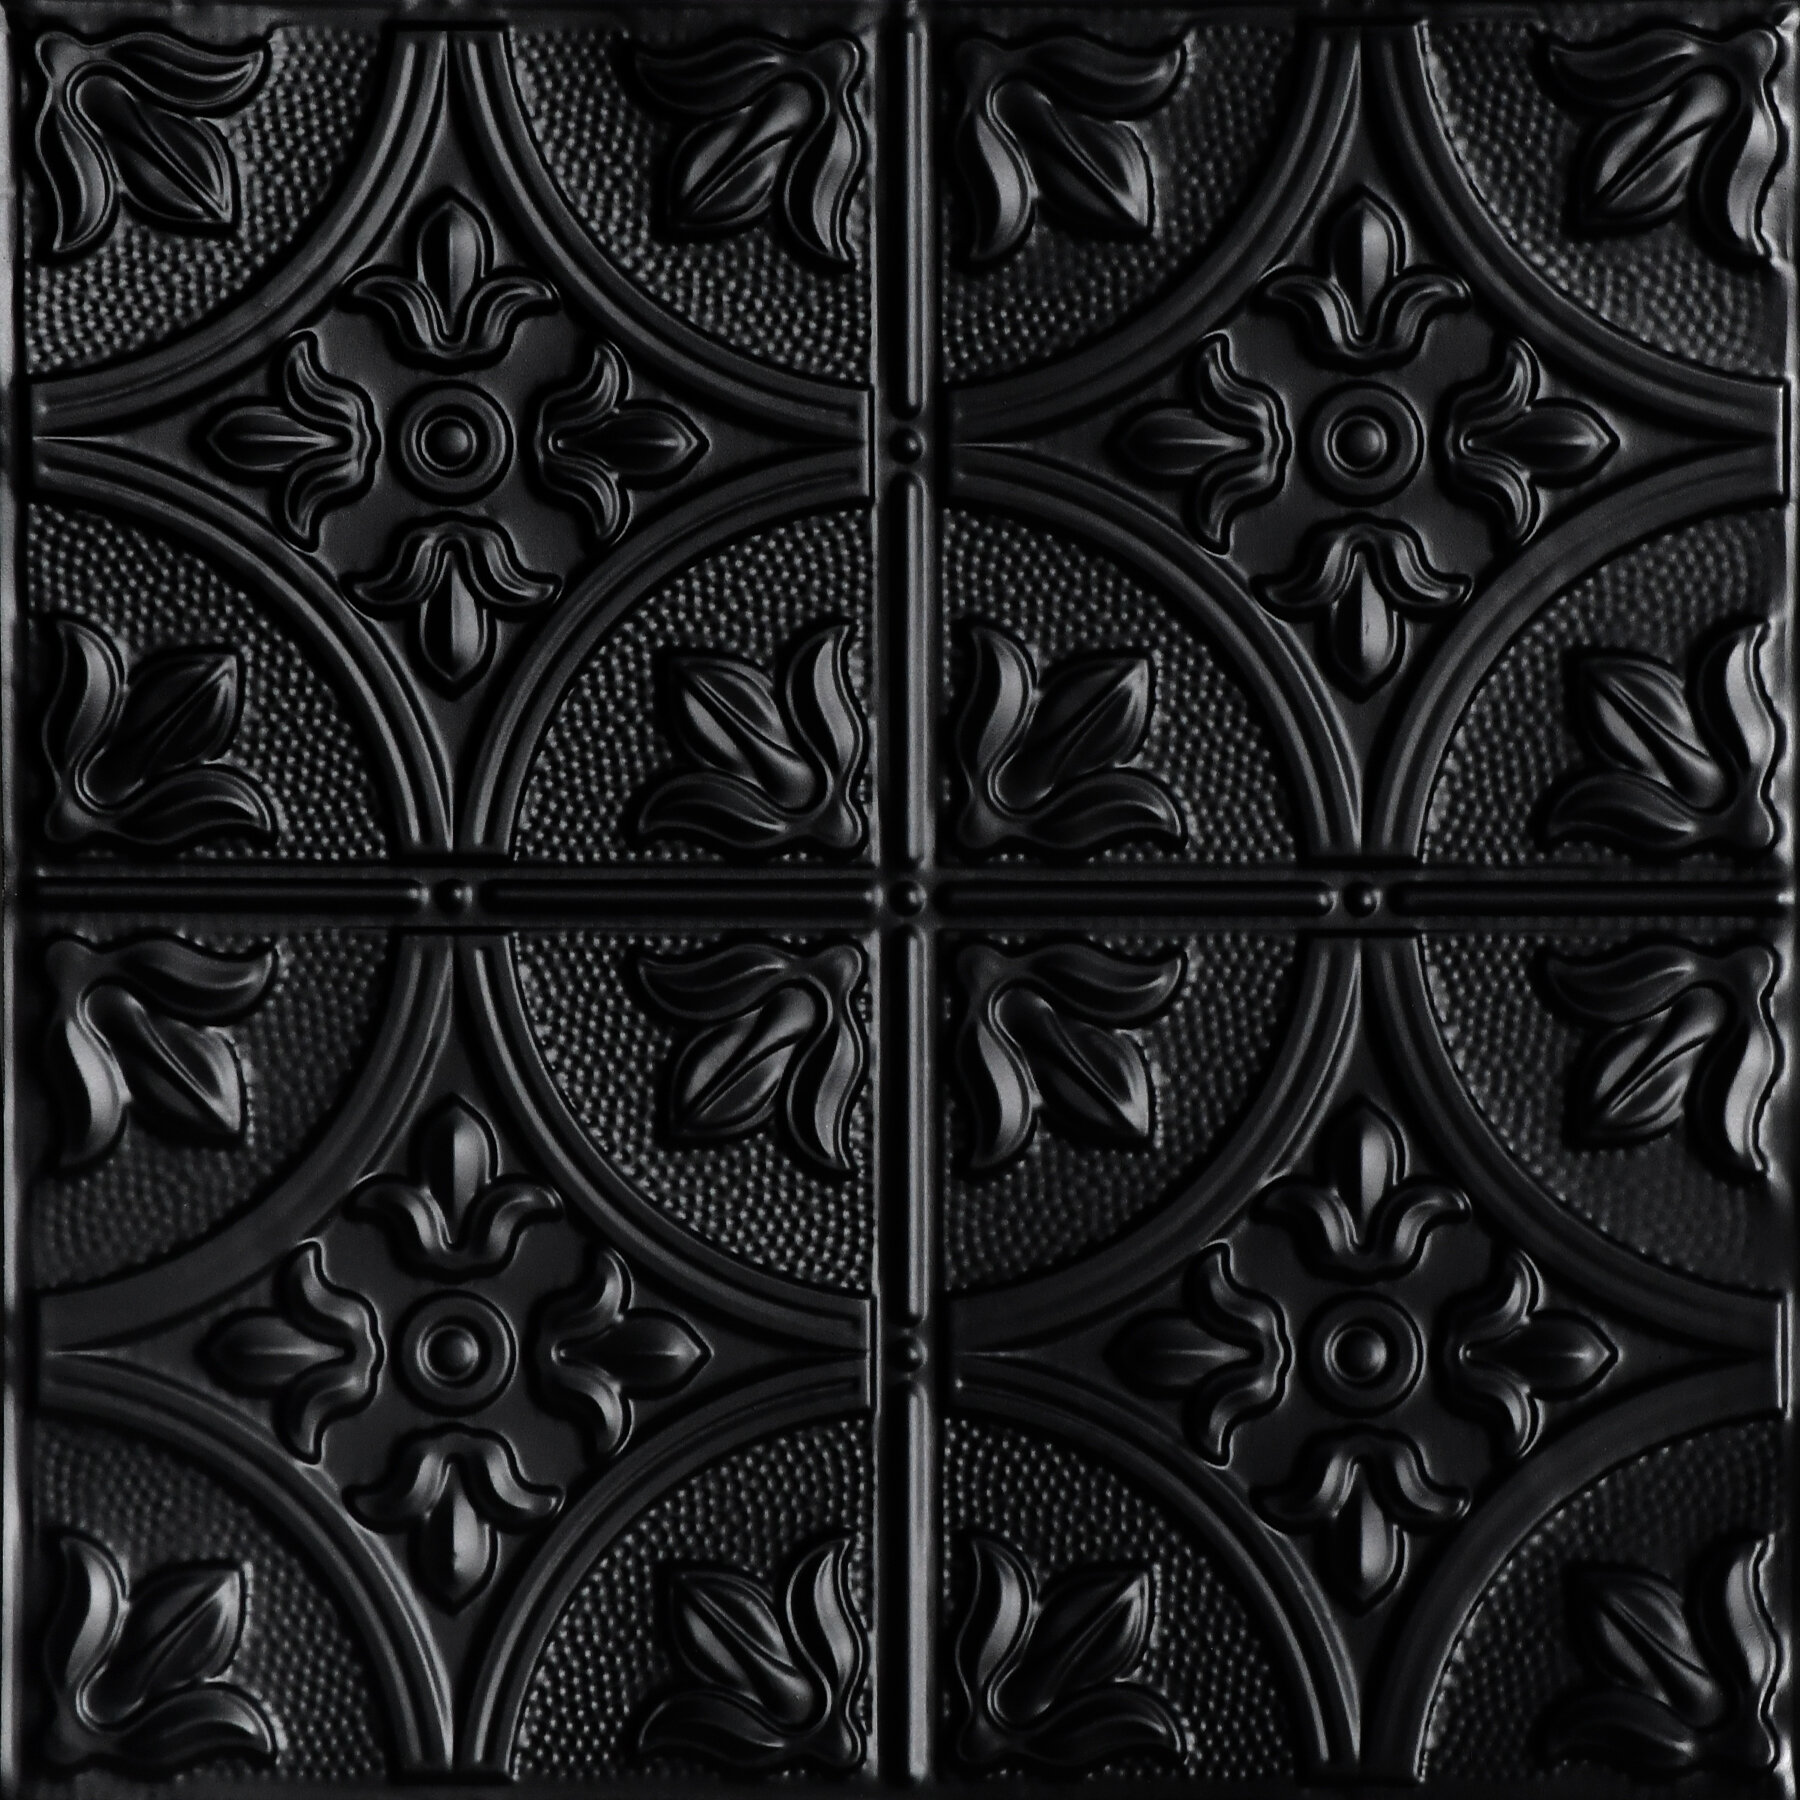 Fromplaintobeautifulinhours Tiptoe 2 Ft X 2 Ft Drop In Ceiling Tile Reviews Wayfair